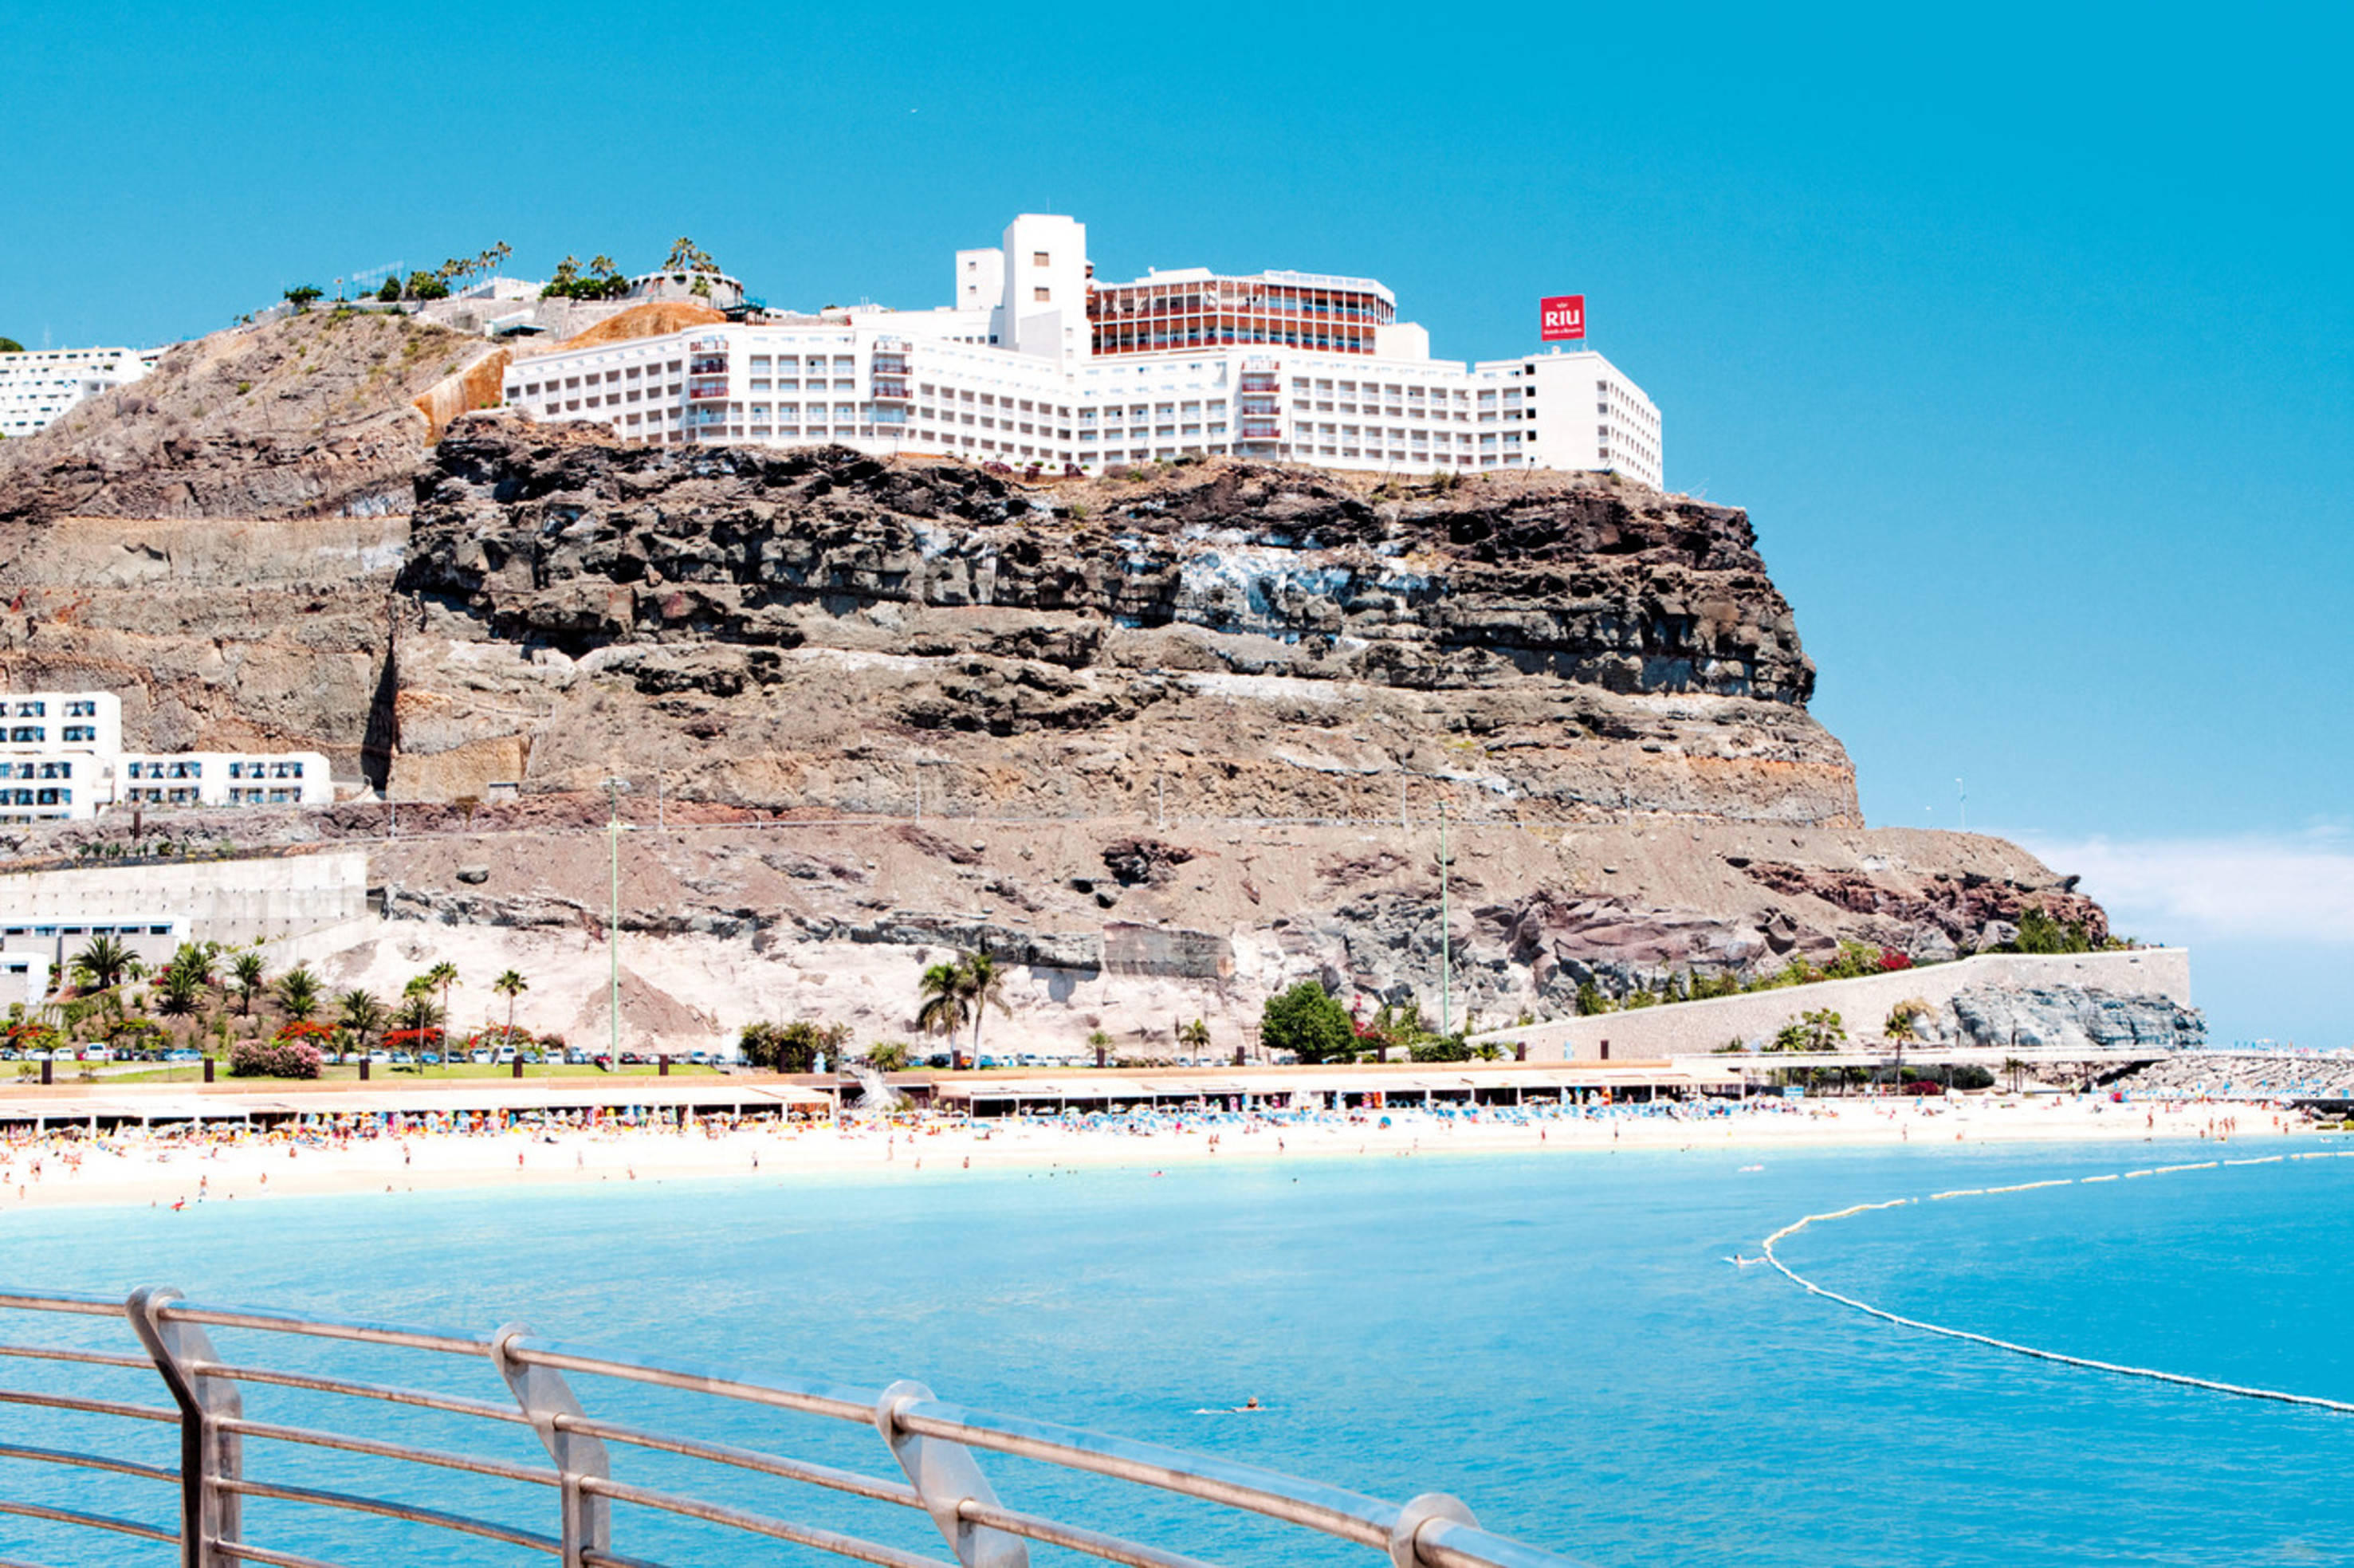 clubhotel riu vistamar in puerto rico holidaycheck gran canaria spanien. Black Bedroom Furniture Sets. Home Design Ideas